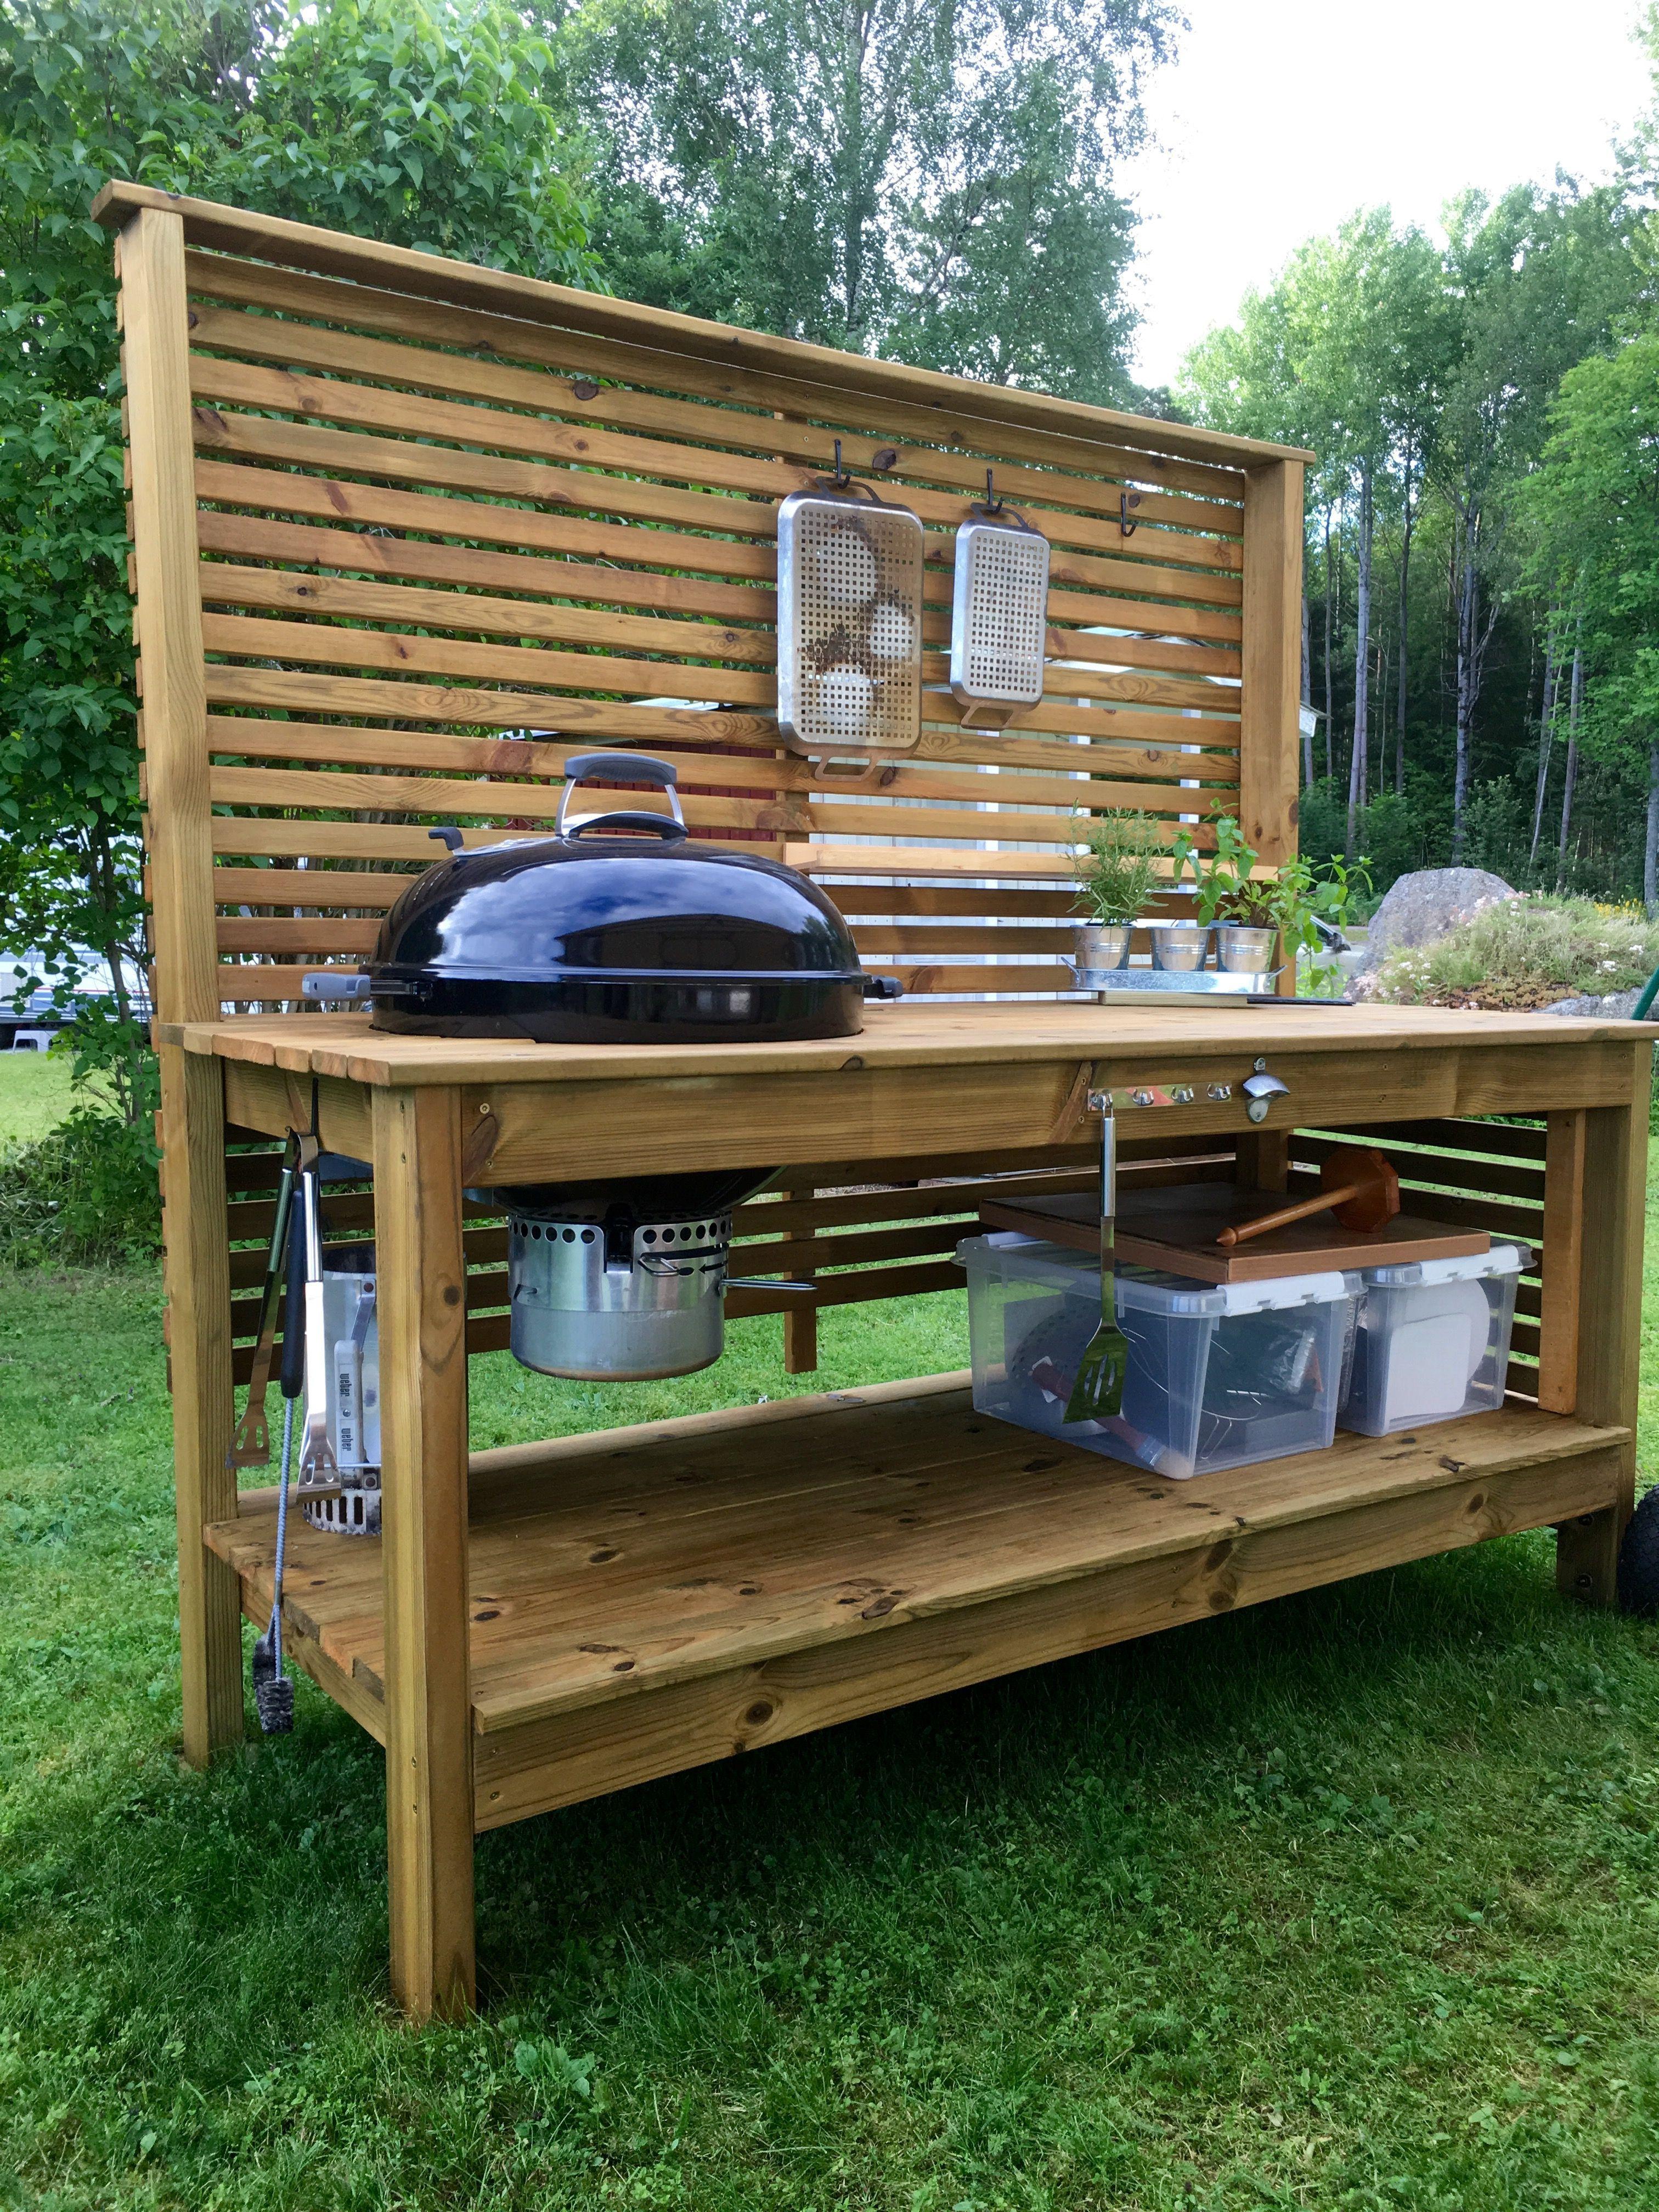 Weber Grill Table Utekok Tradgard Outdoor Kitchen Grillbank Utegrill Bbq Utomhuskok Bakgard Altaner Ute